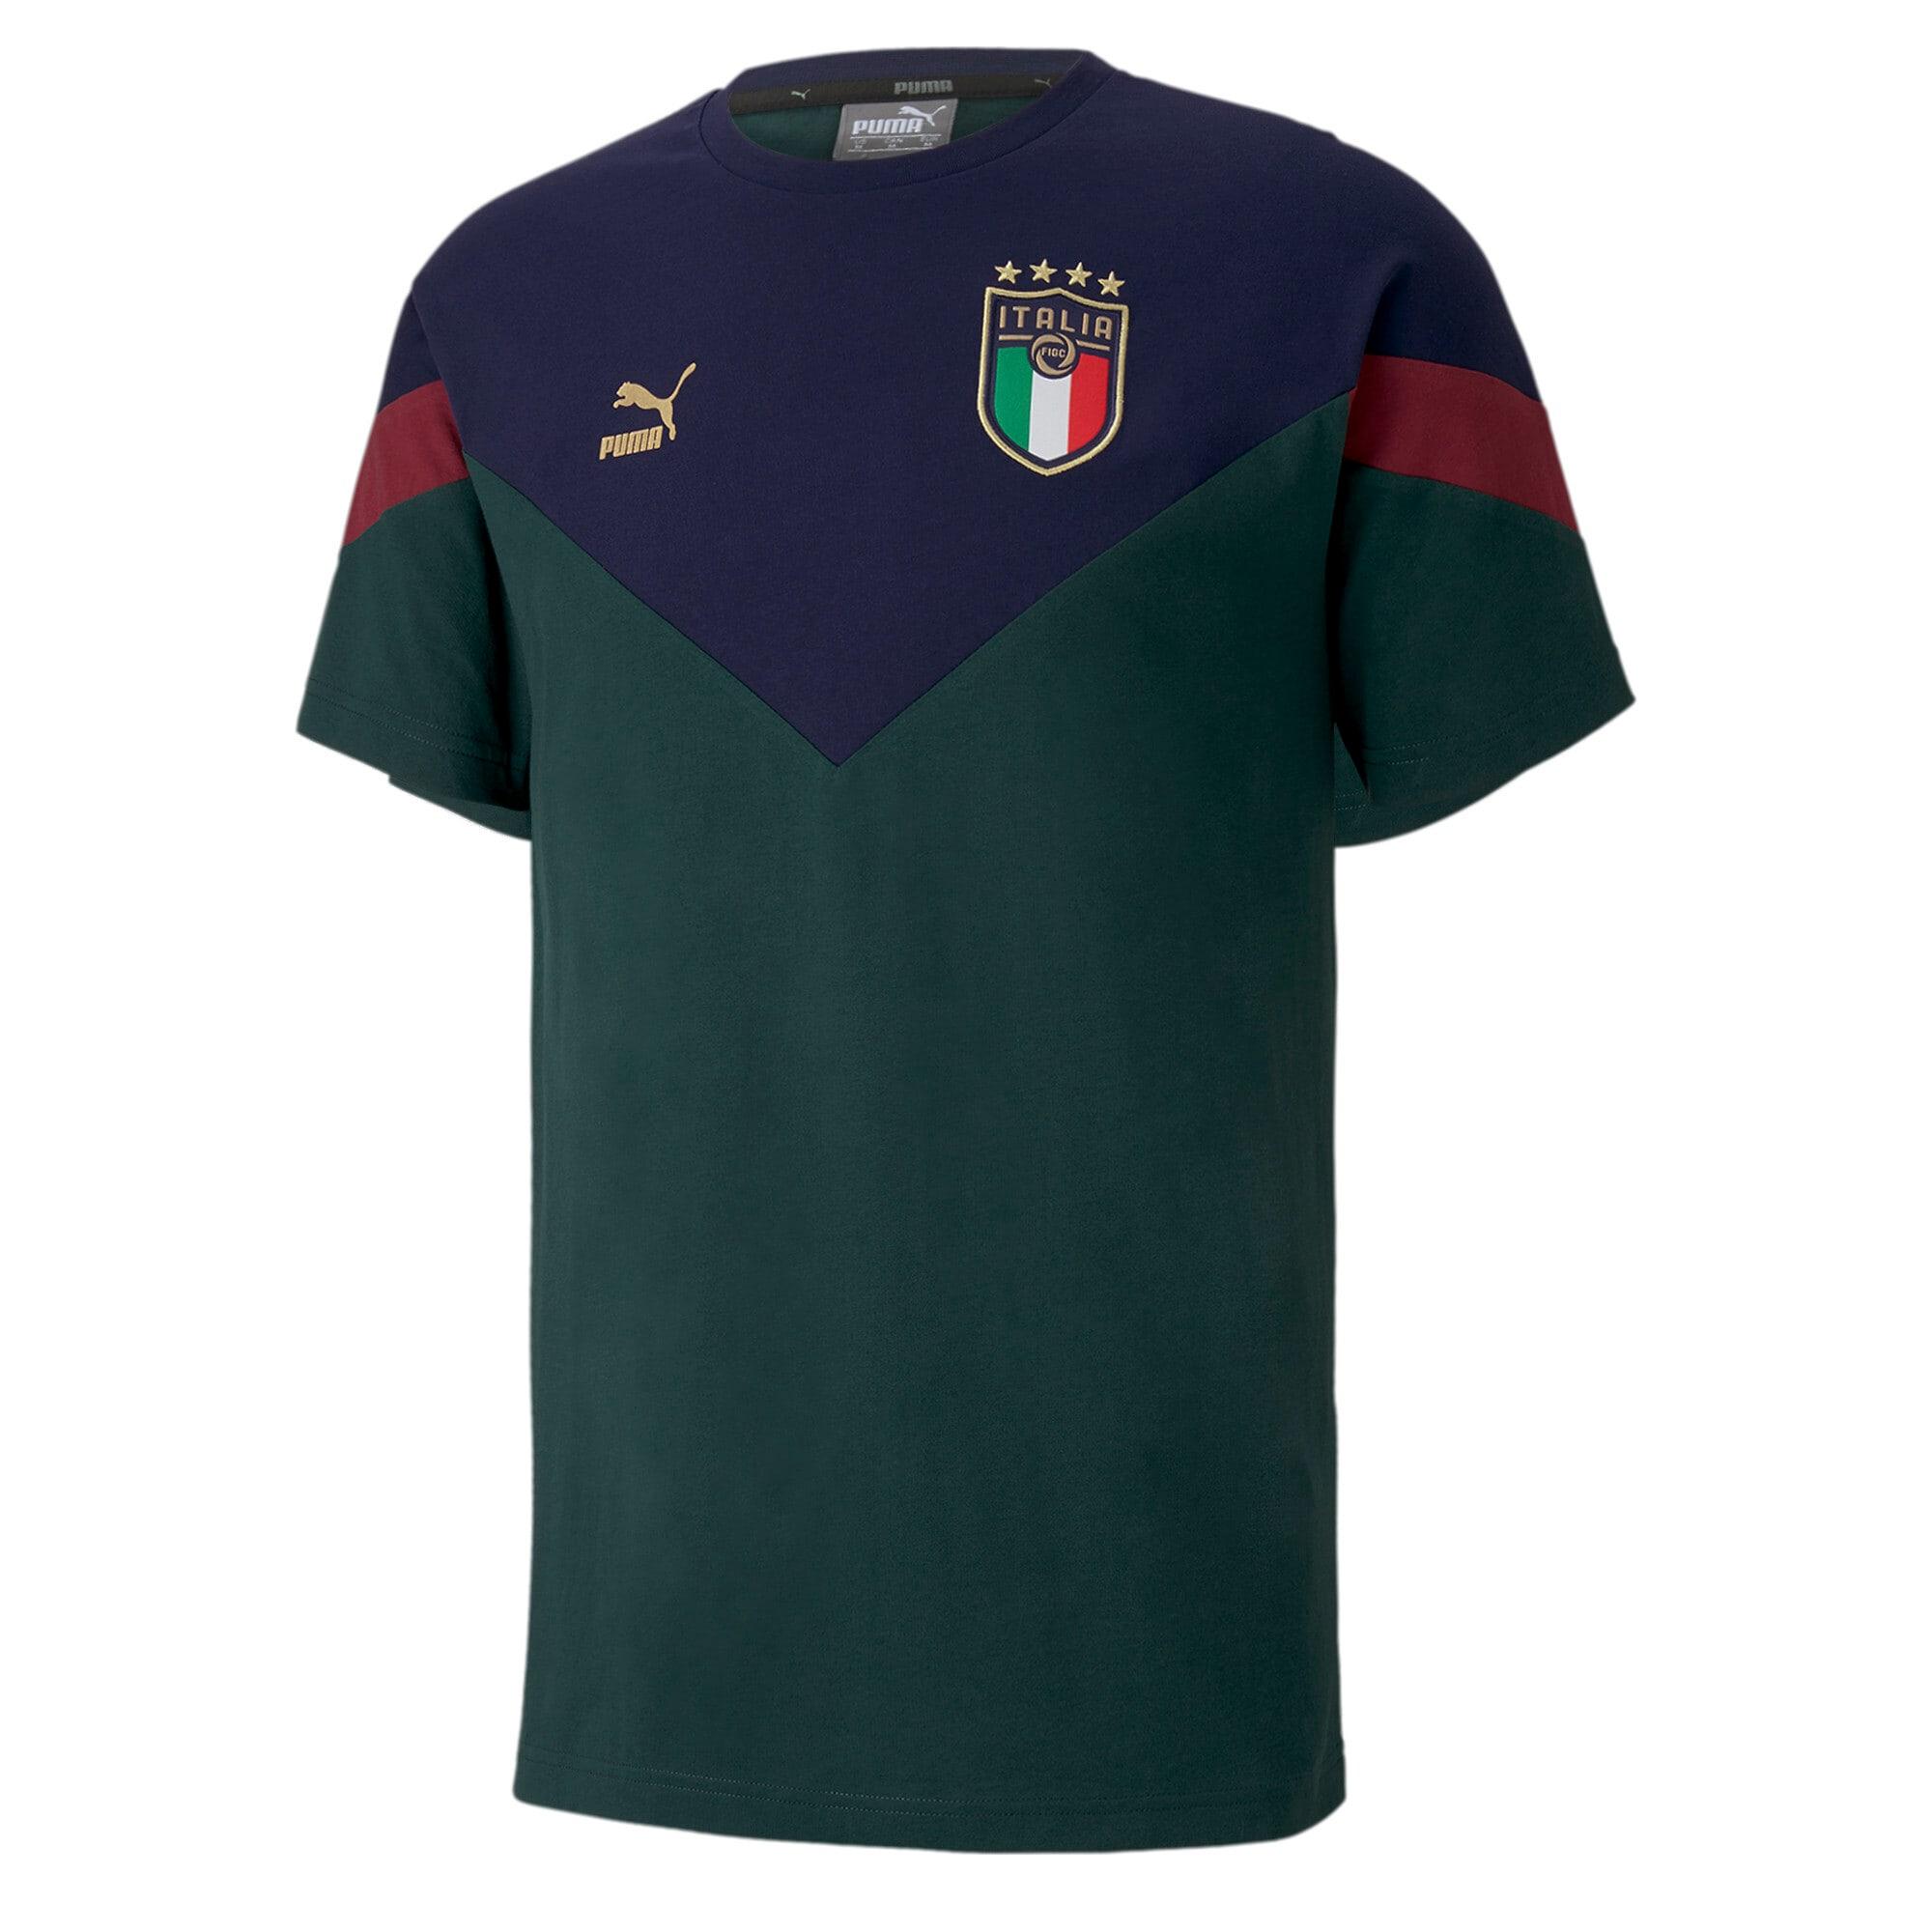 Thumbnail 1 of FIGC イタリア ICONIC MCS Tシャツ 半袖, Ponderosa Pine-peacoat, medium-JPN